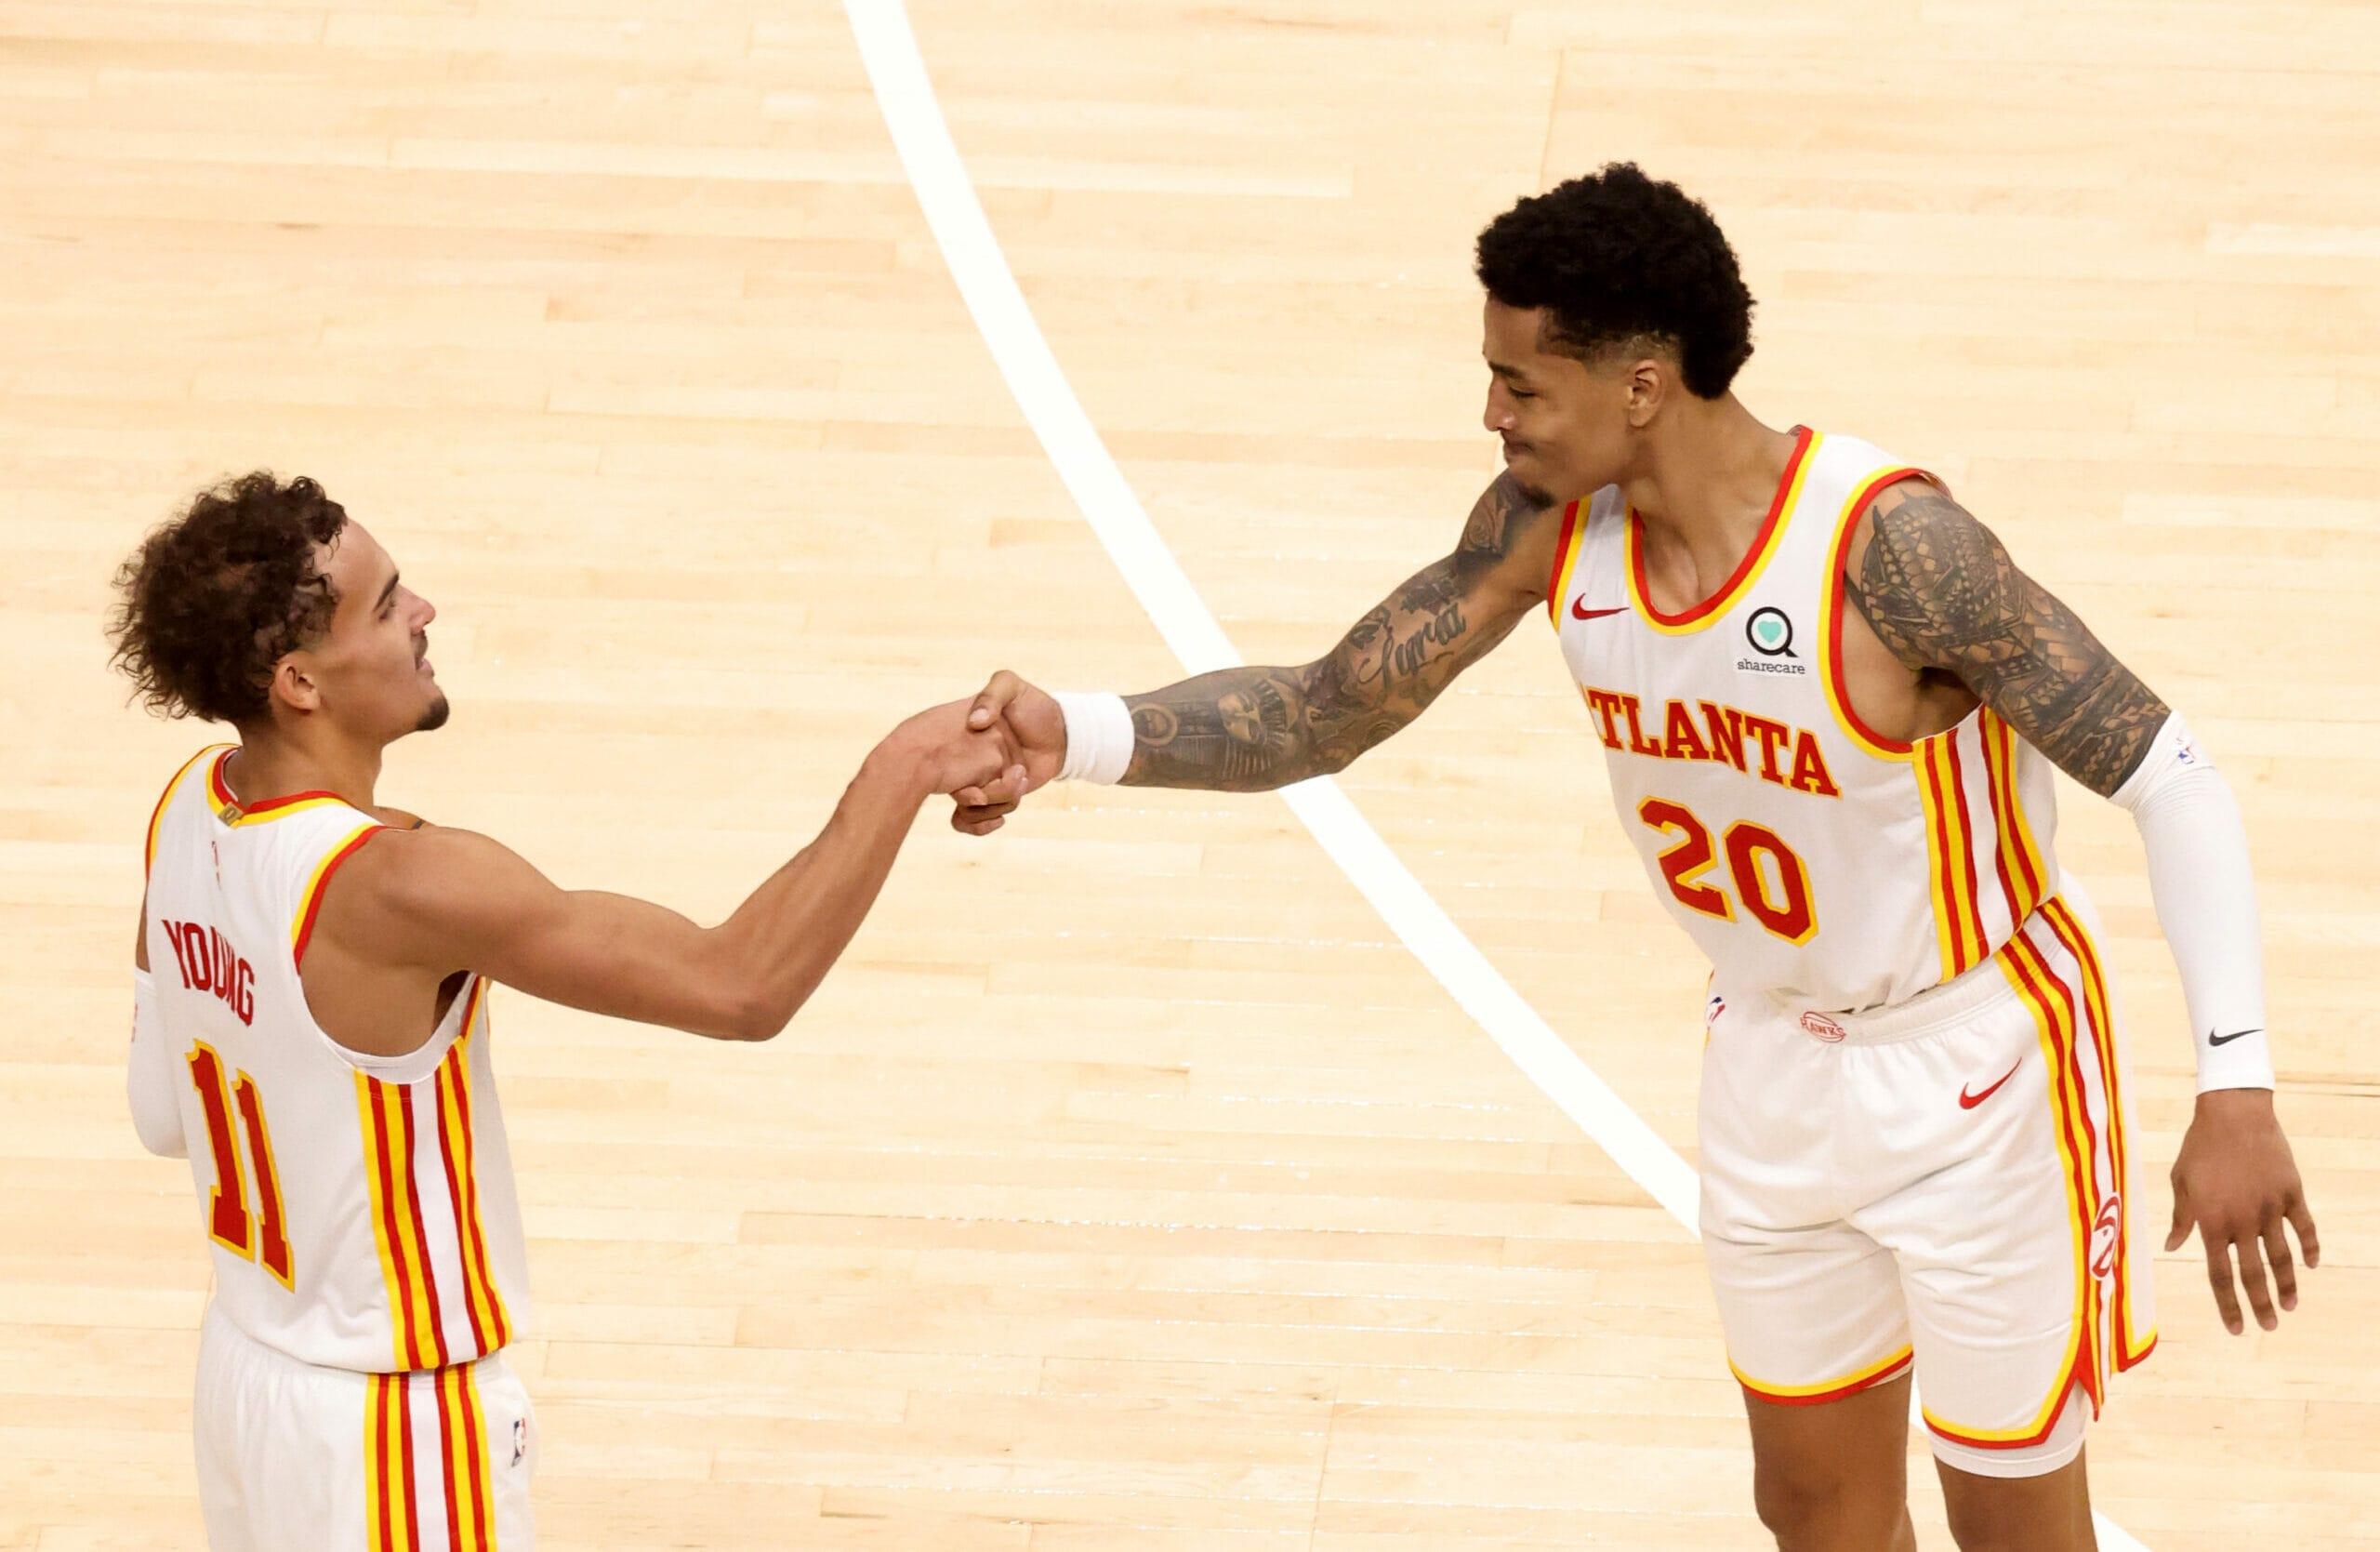 2021 Midseason report: Atlanta Hawks